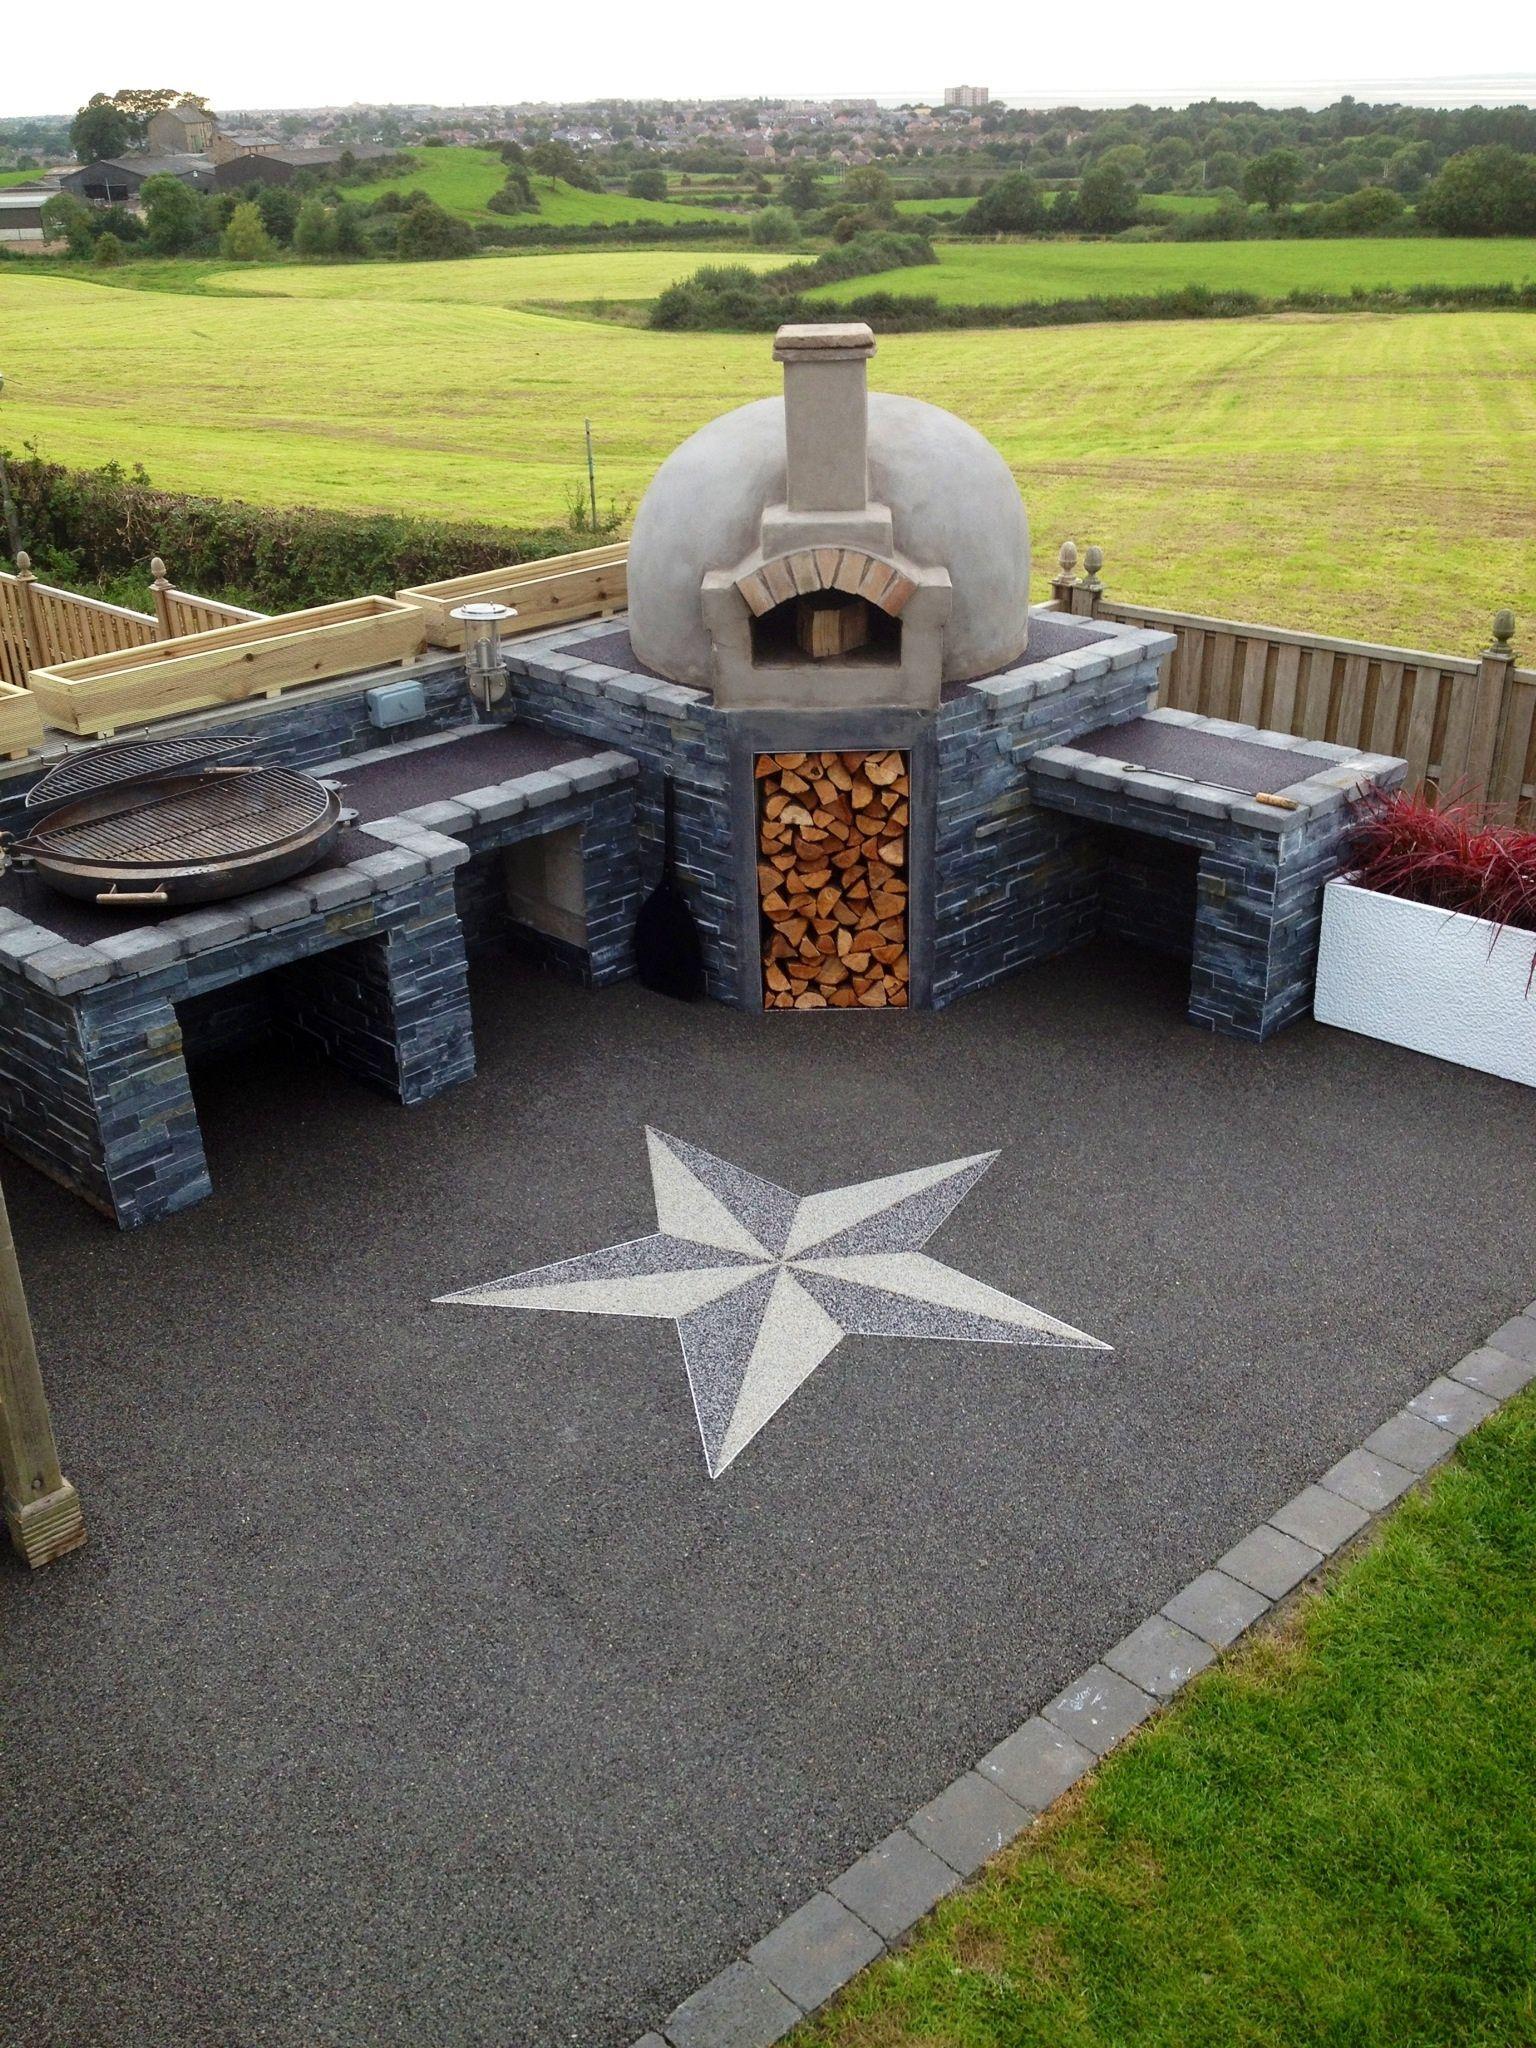 25 Incredible Outdoor Kitchen Ideas Podworka Domowy Ogrod Ogrod W Domu